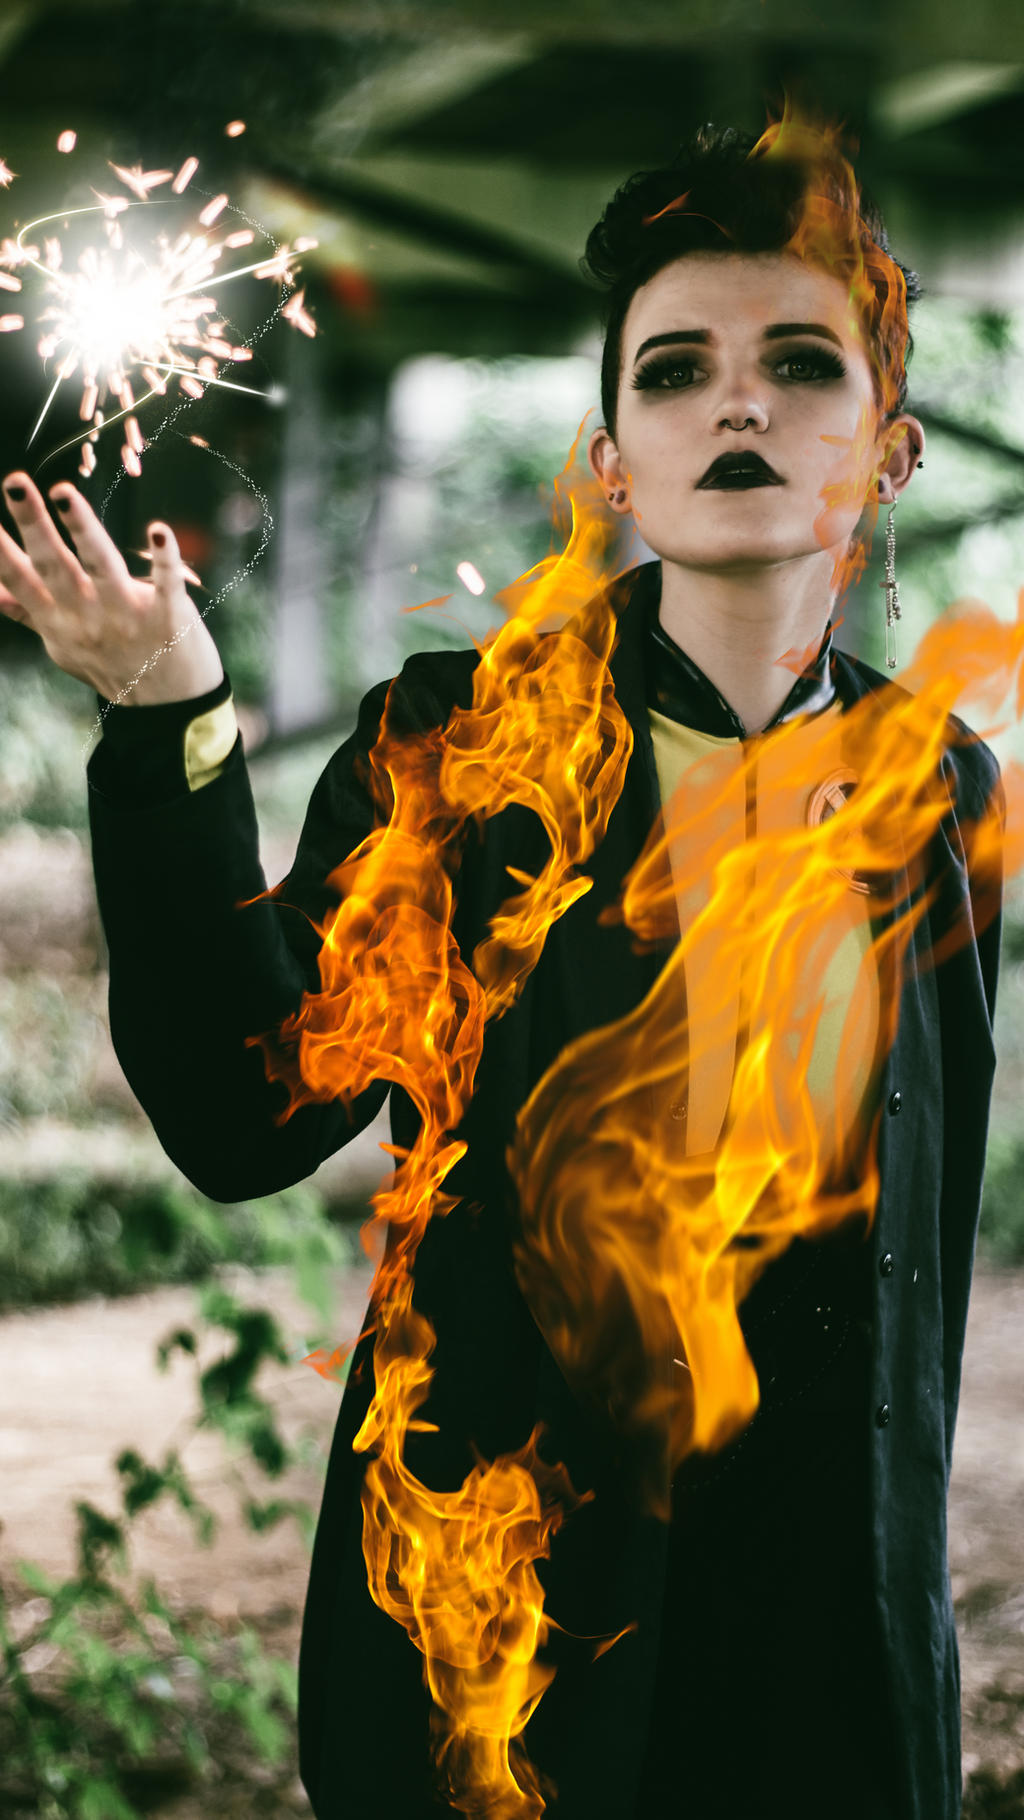 Negasonic Teenage Warhead Cosplay 3 by mblackburn